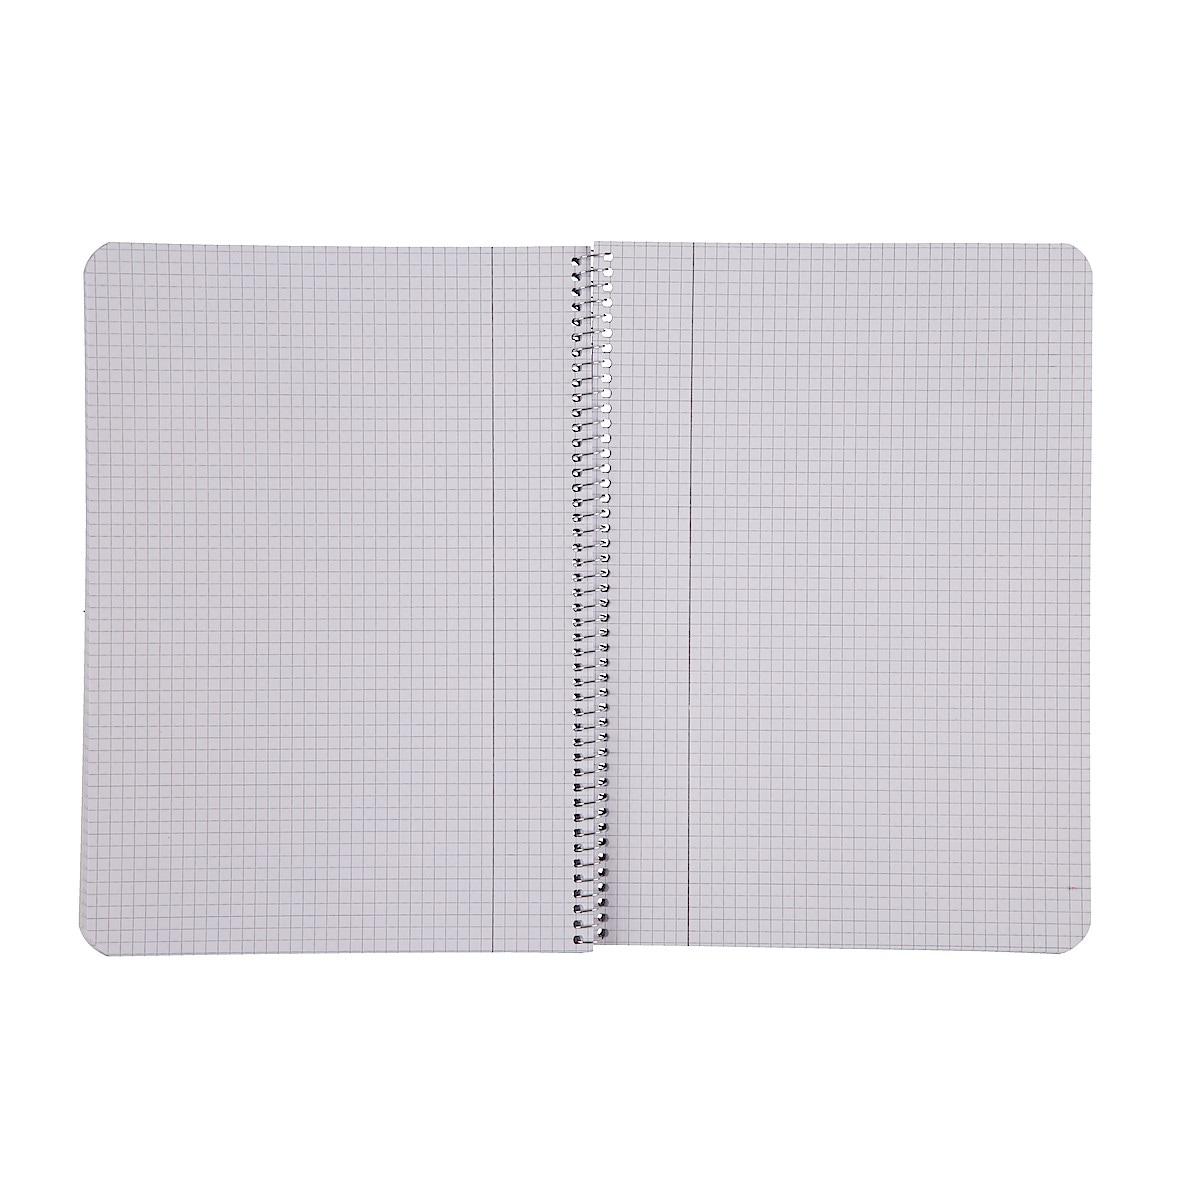 Kollegieblock A4 3-pack